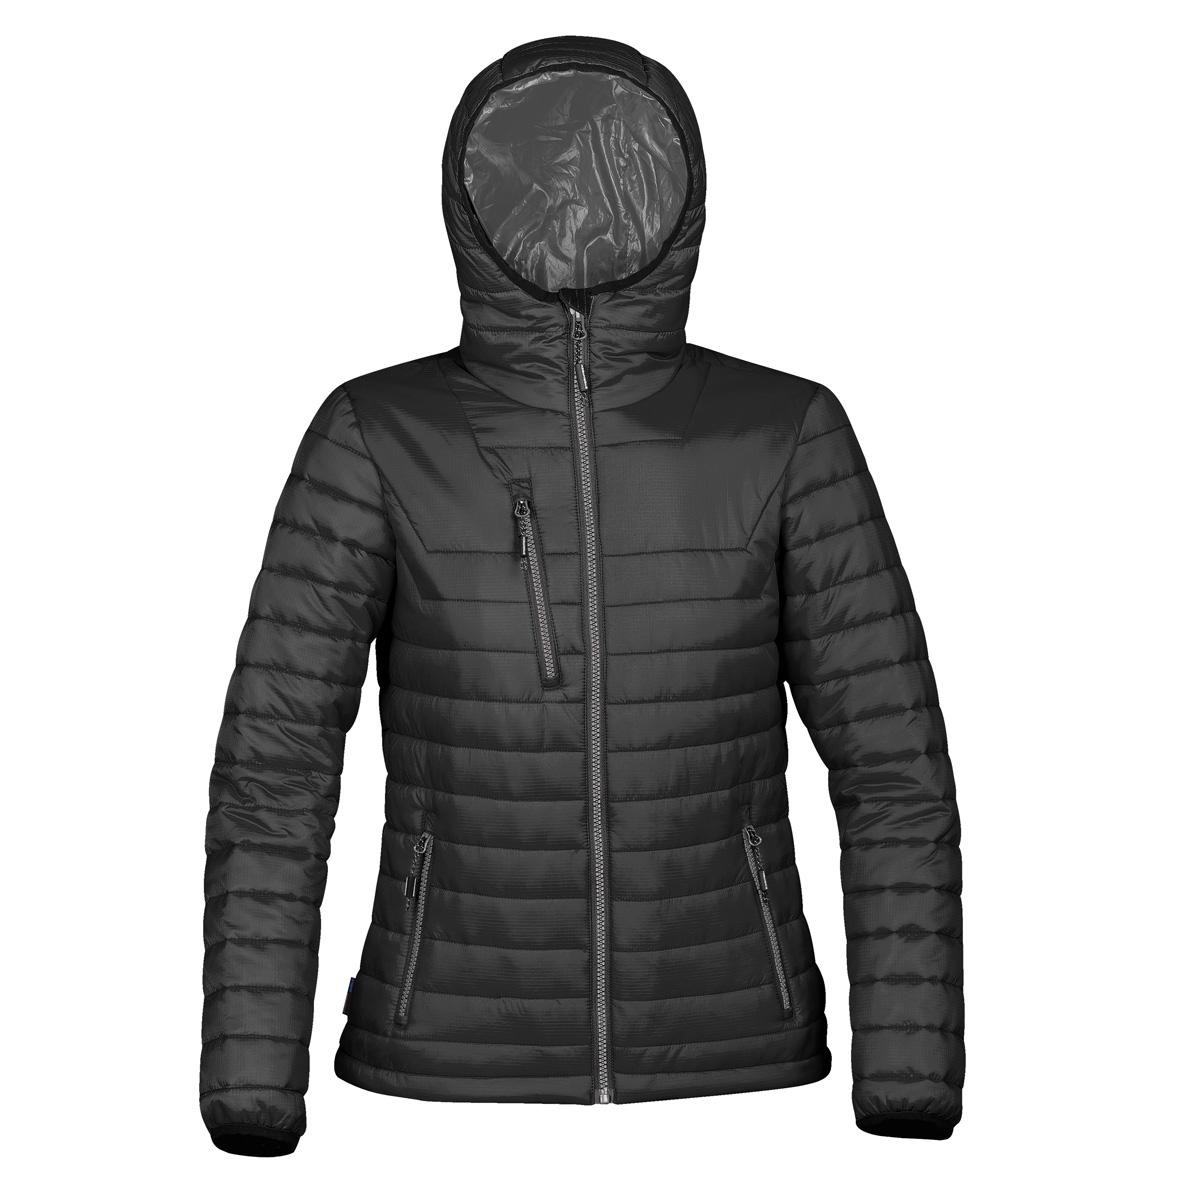 Stormtech Womens/Ladies Gravity Thermal Jacket (M) (Black/Charcoal)